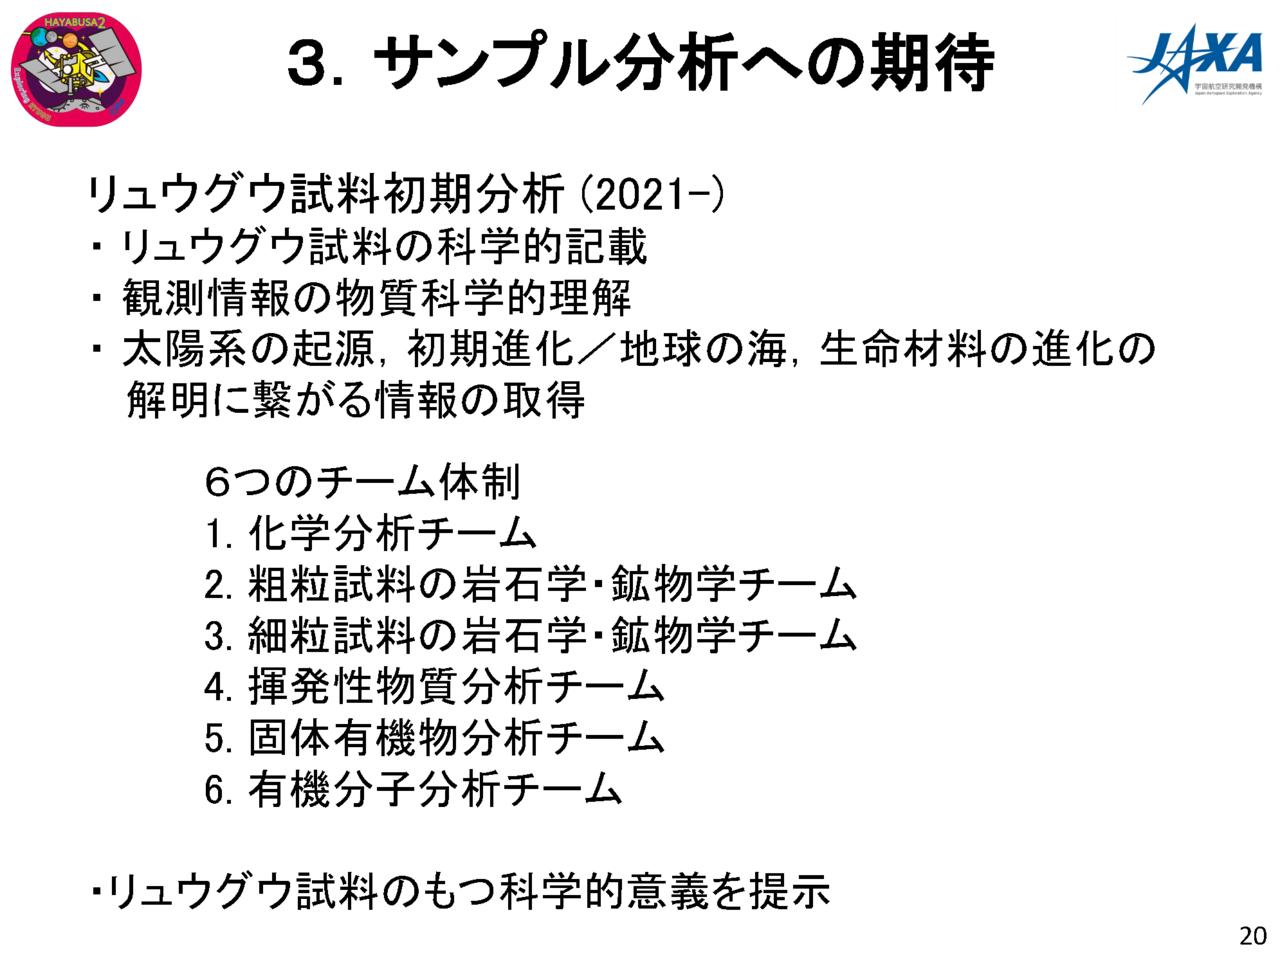 f:id:Imamura:20180719131715p:plain